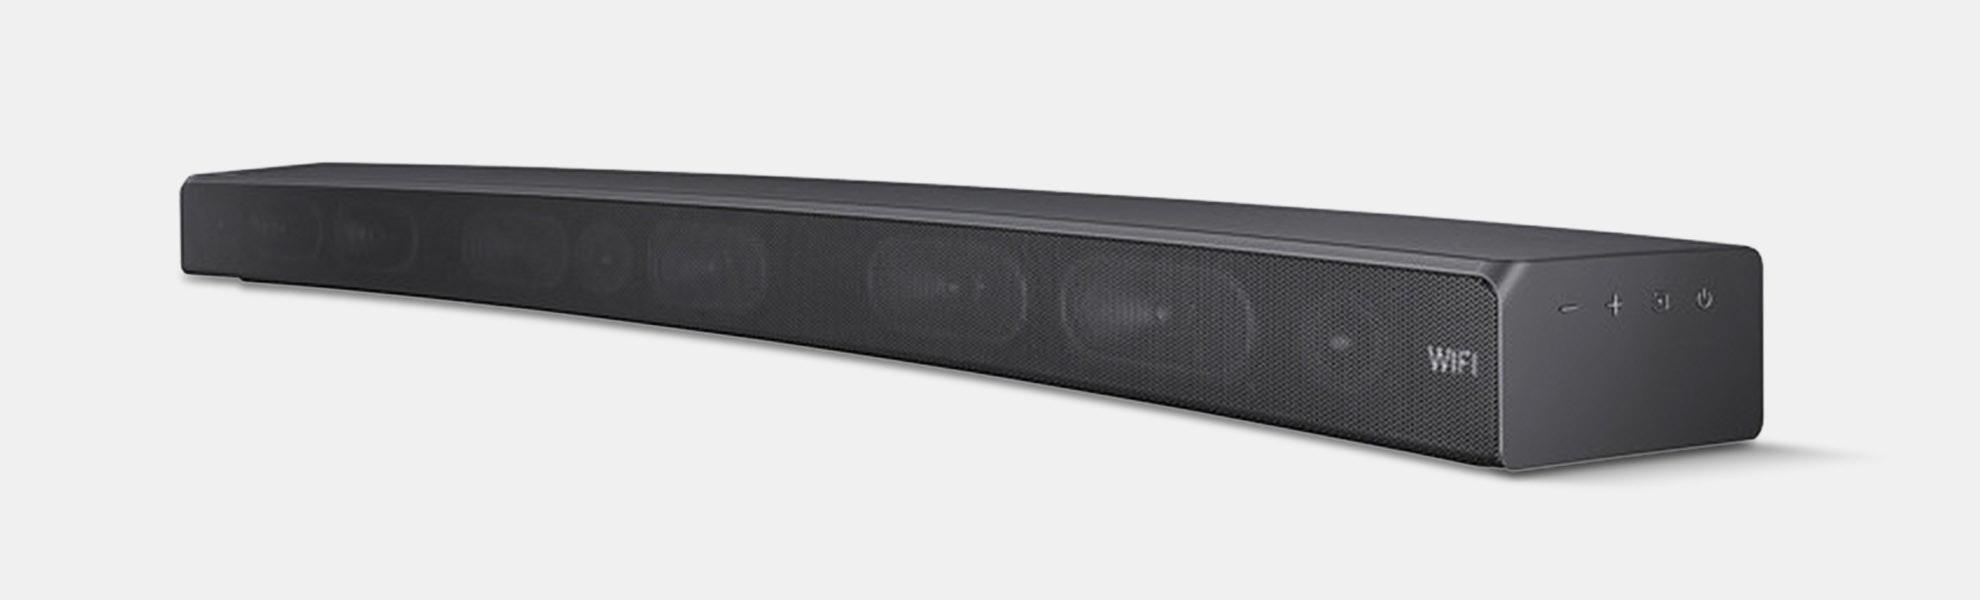 Samsung HW-MS6500 Sound+ Curved Premium Soundbar